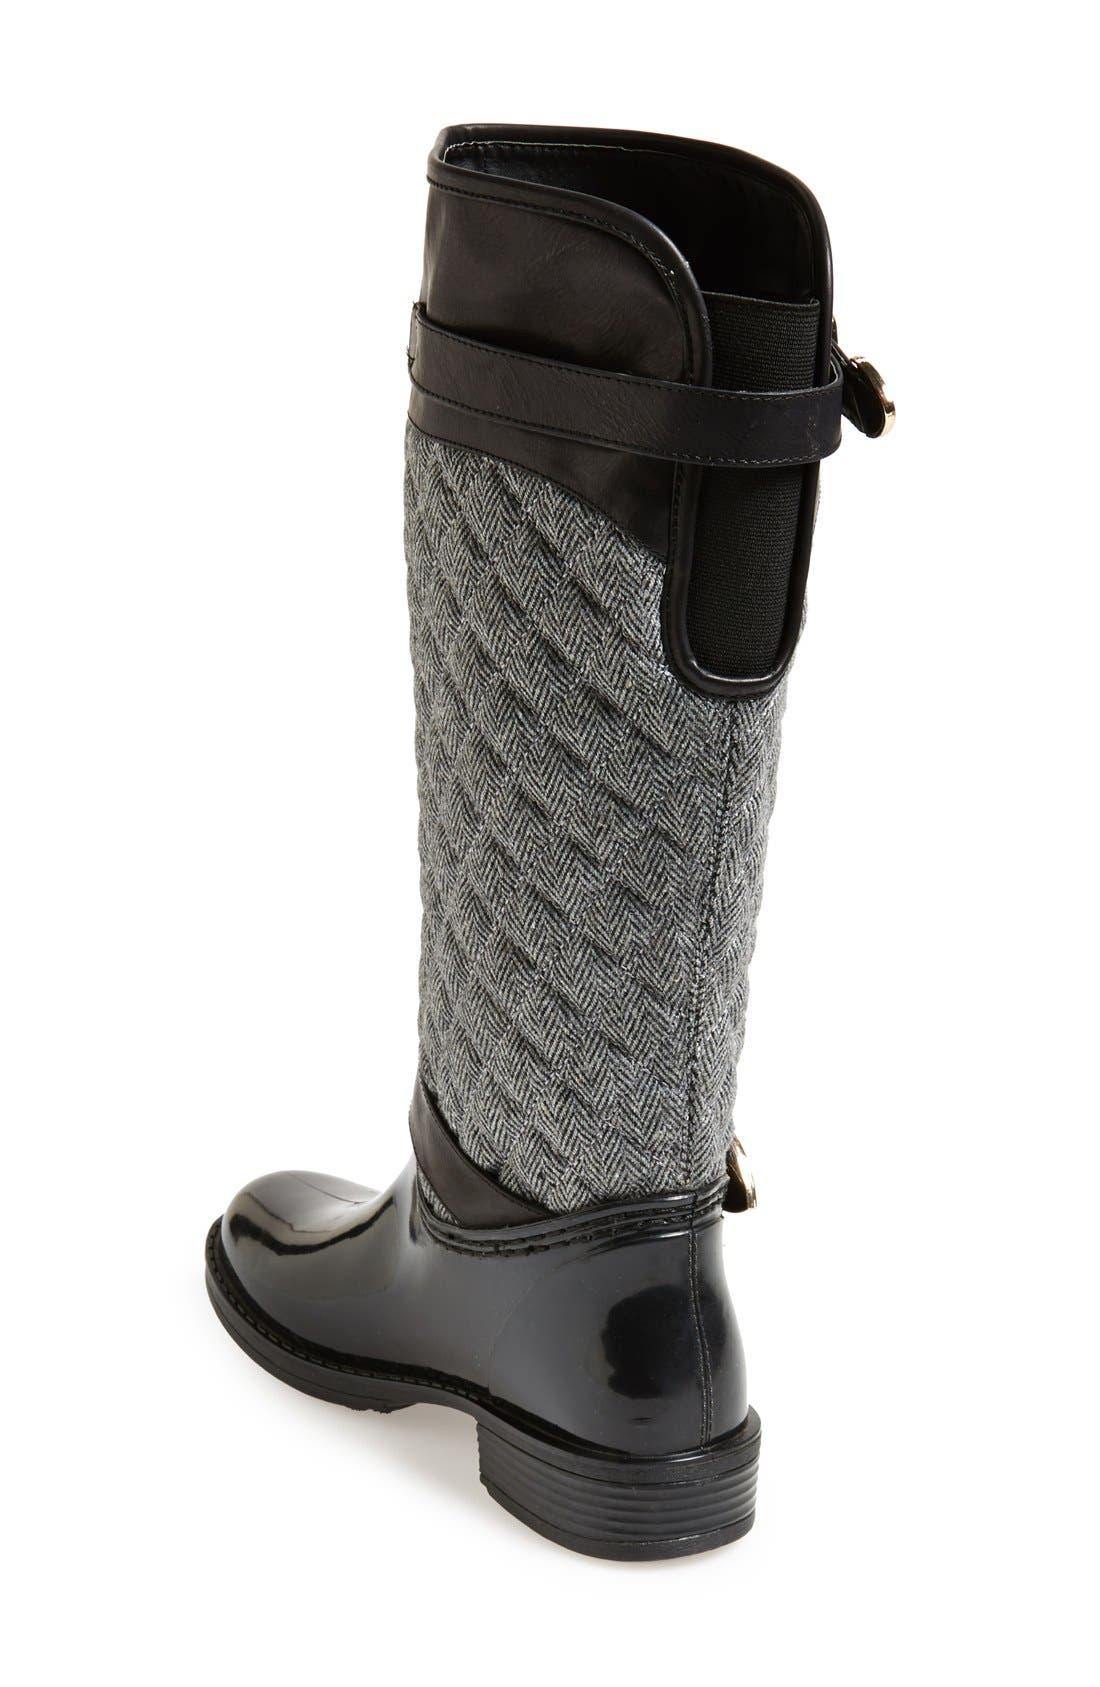 Alternate Image 2  - Posh Wellies 'Peacon' Quilted Tall Rain Boot (Women)